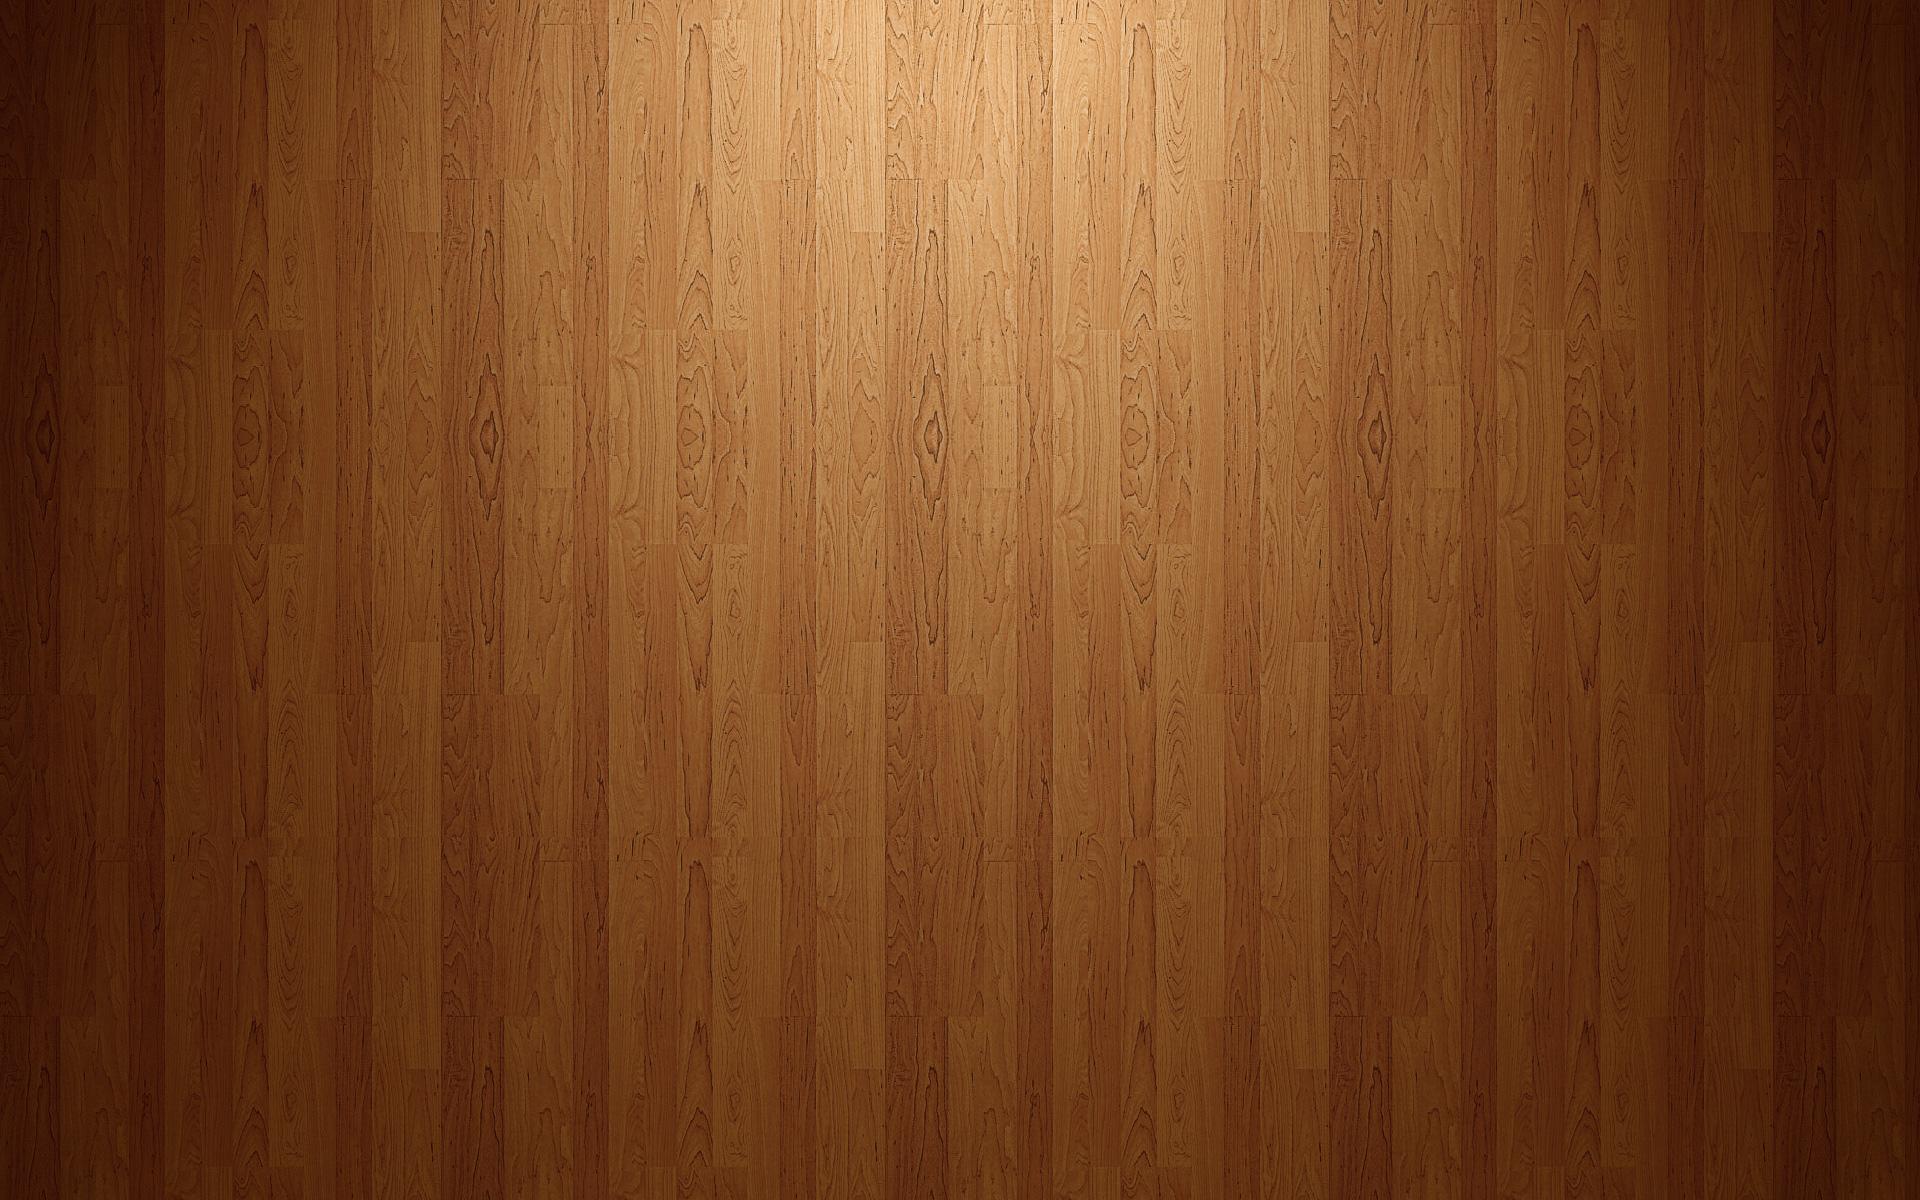 Wood wallpaper 10120 1920x1200 px hdwallsource wood wallpaper 10120 altavistaventures Image collections